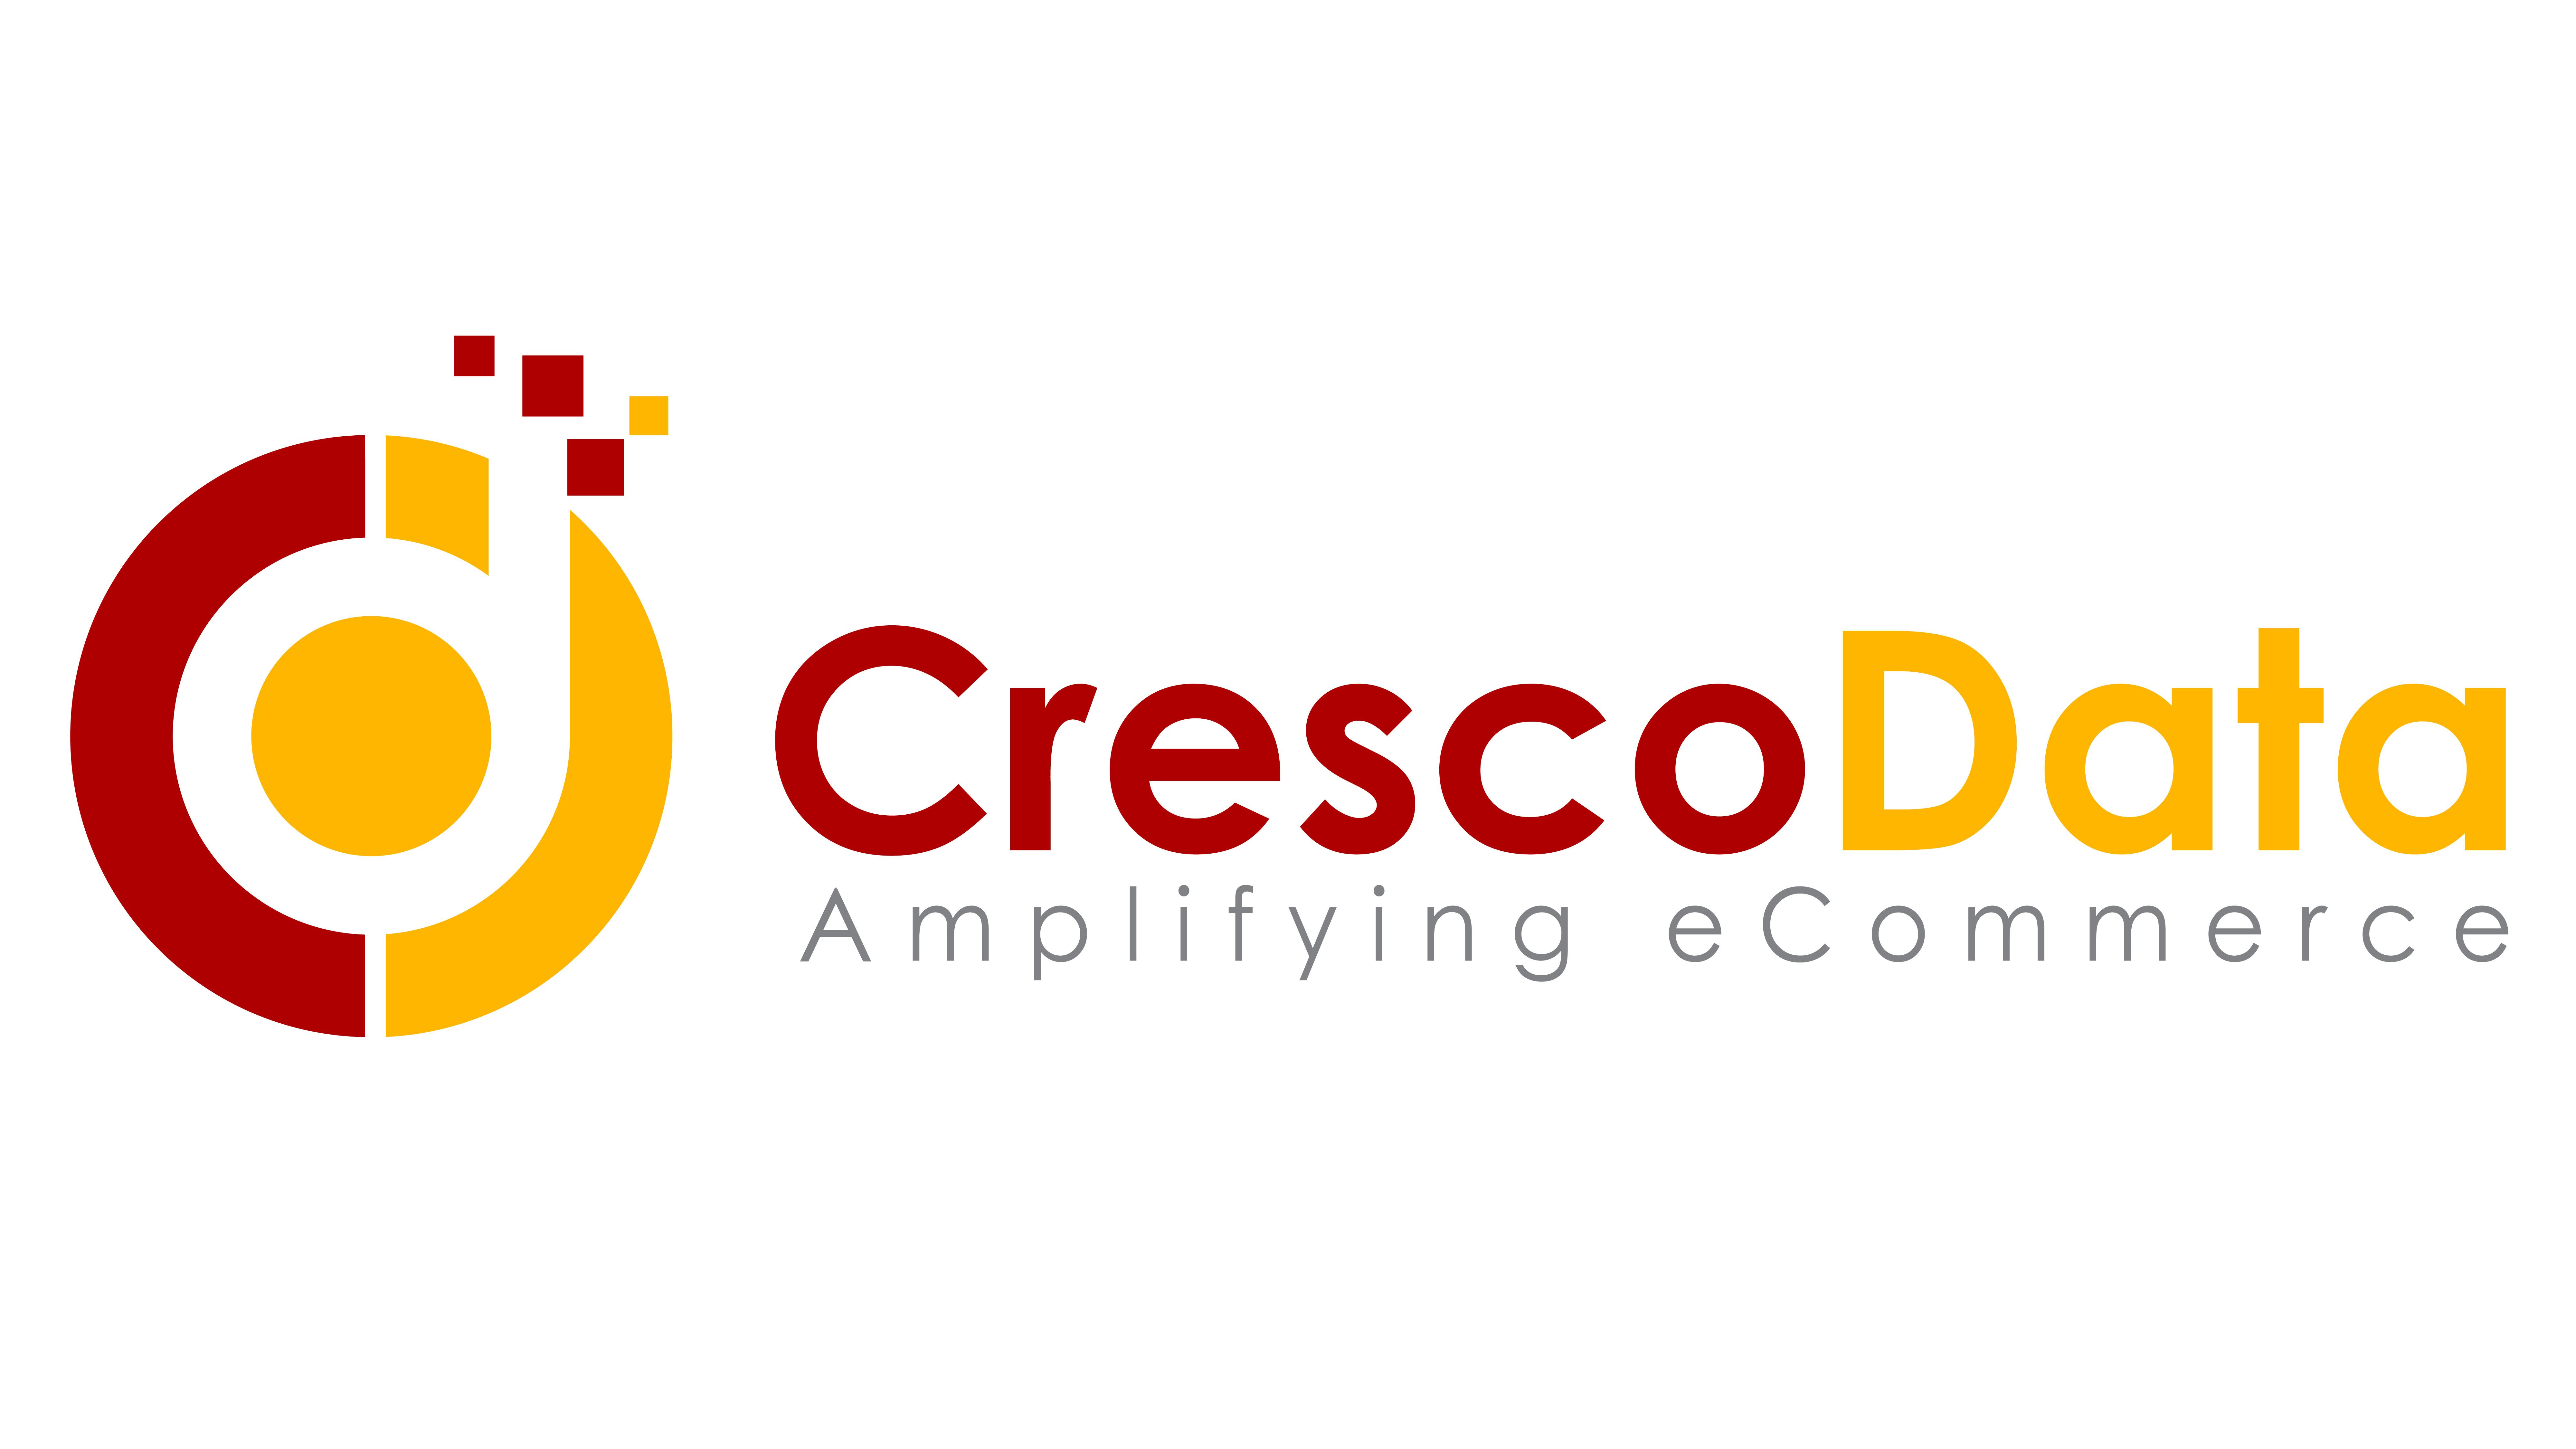 Cresco Data Pte Ltd is hiring on Meet.jobs!